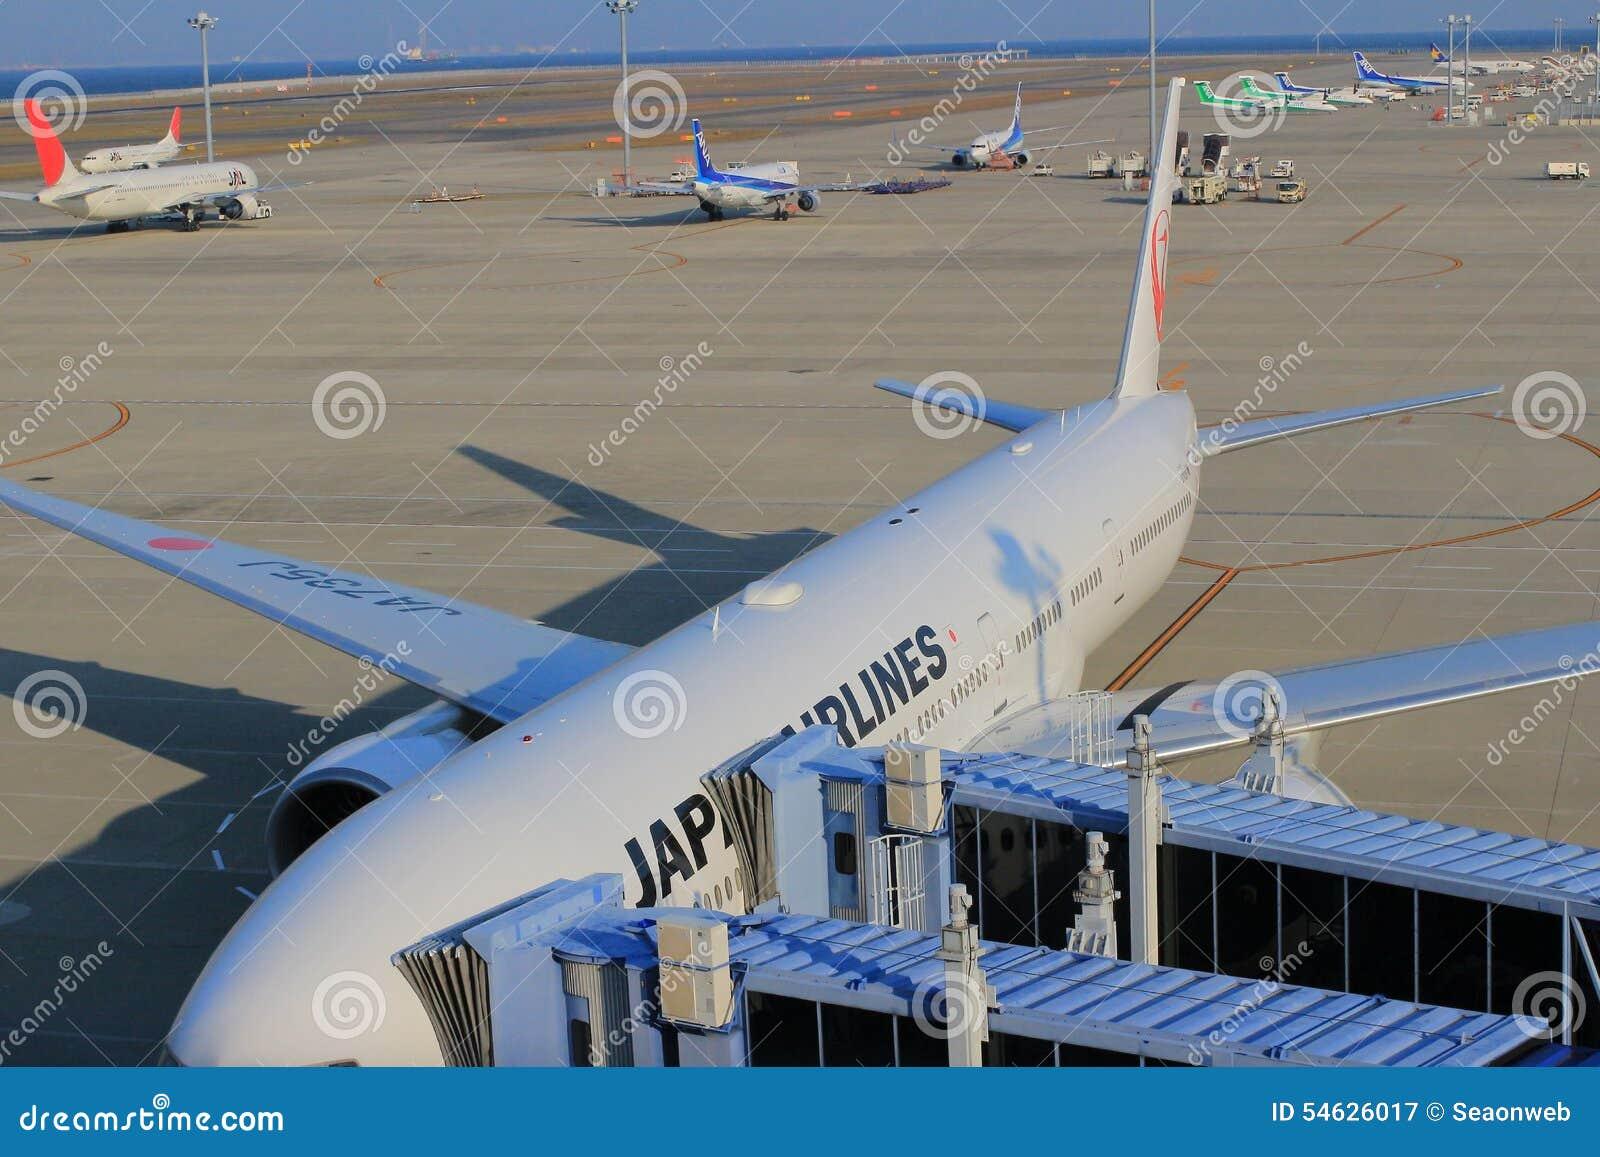 Aeroporto Nagoya : Nagoya aeroporto internacional de chubu centrair